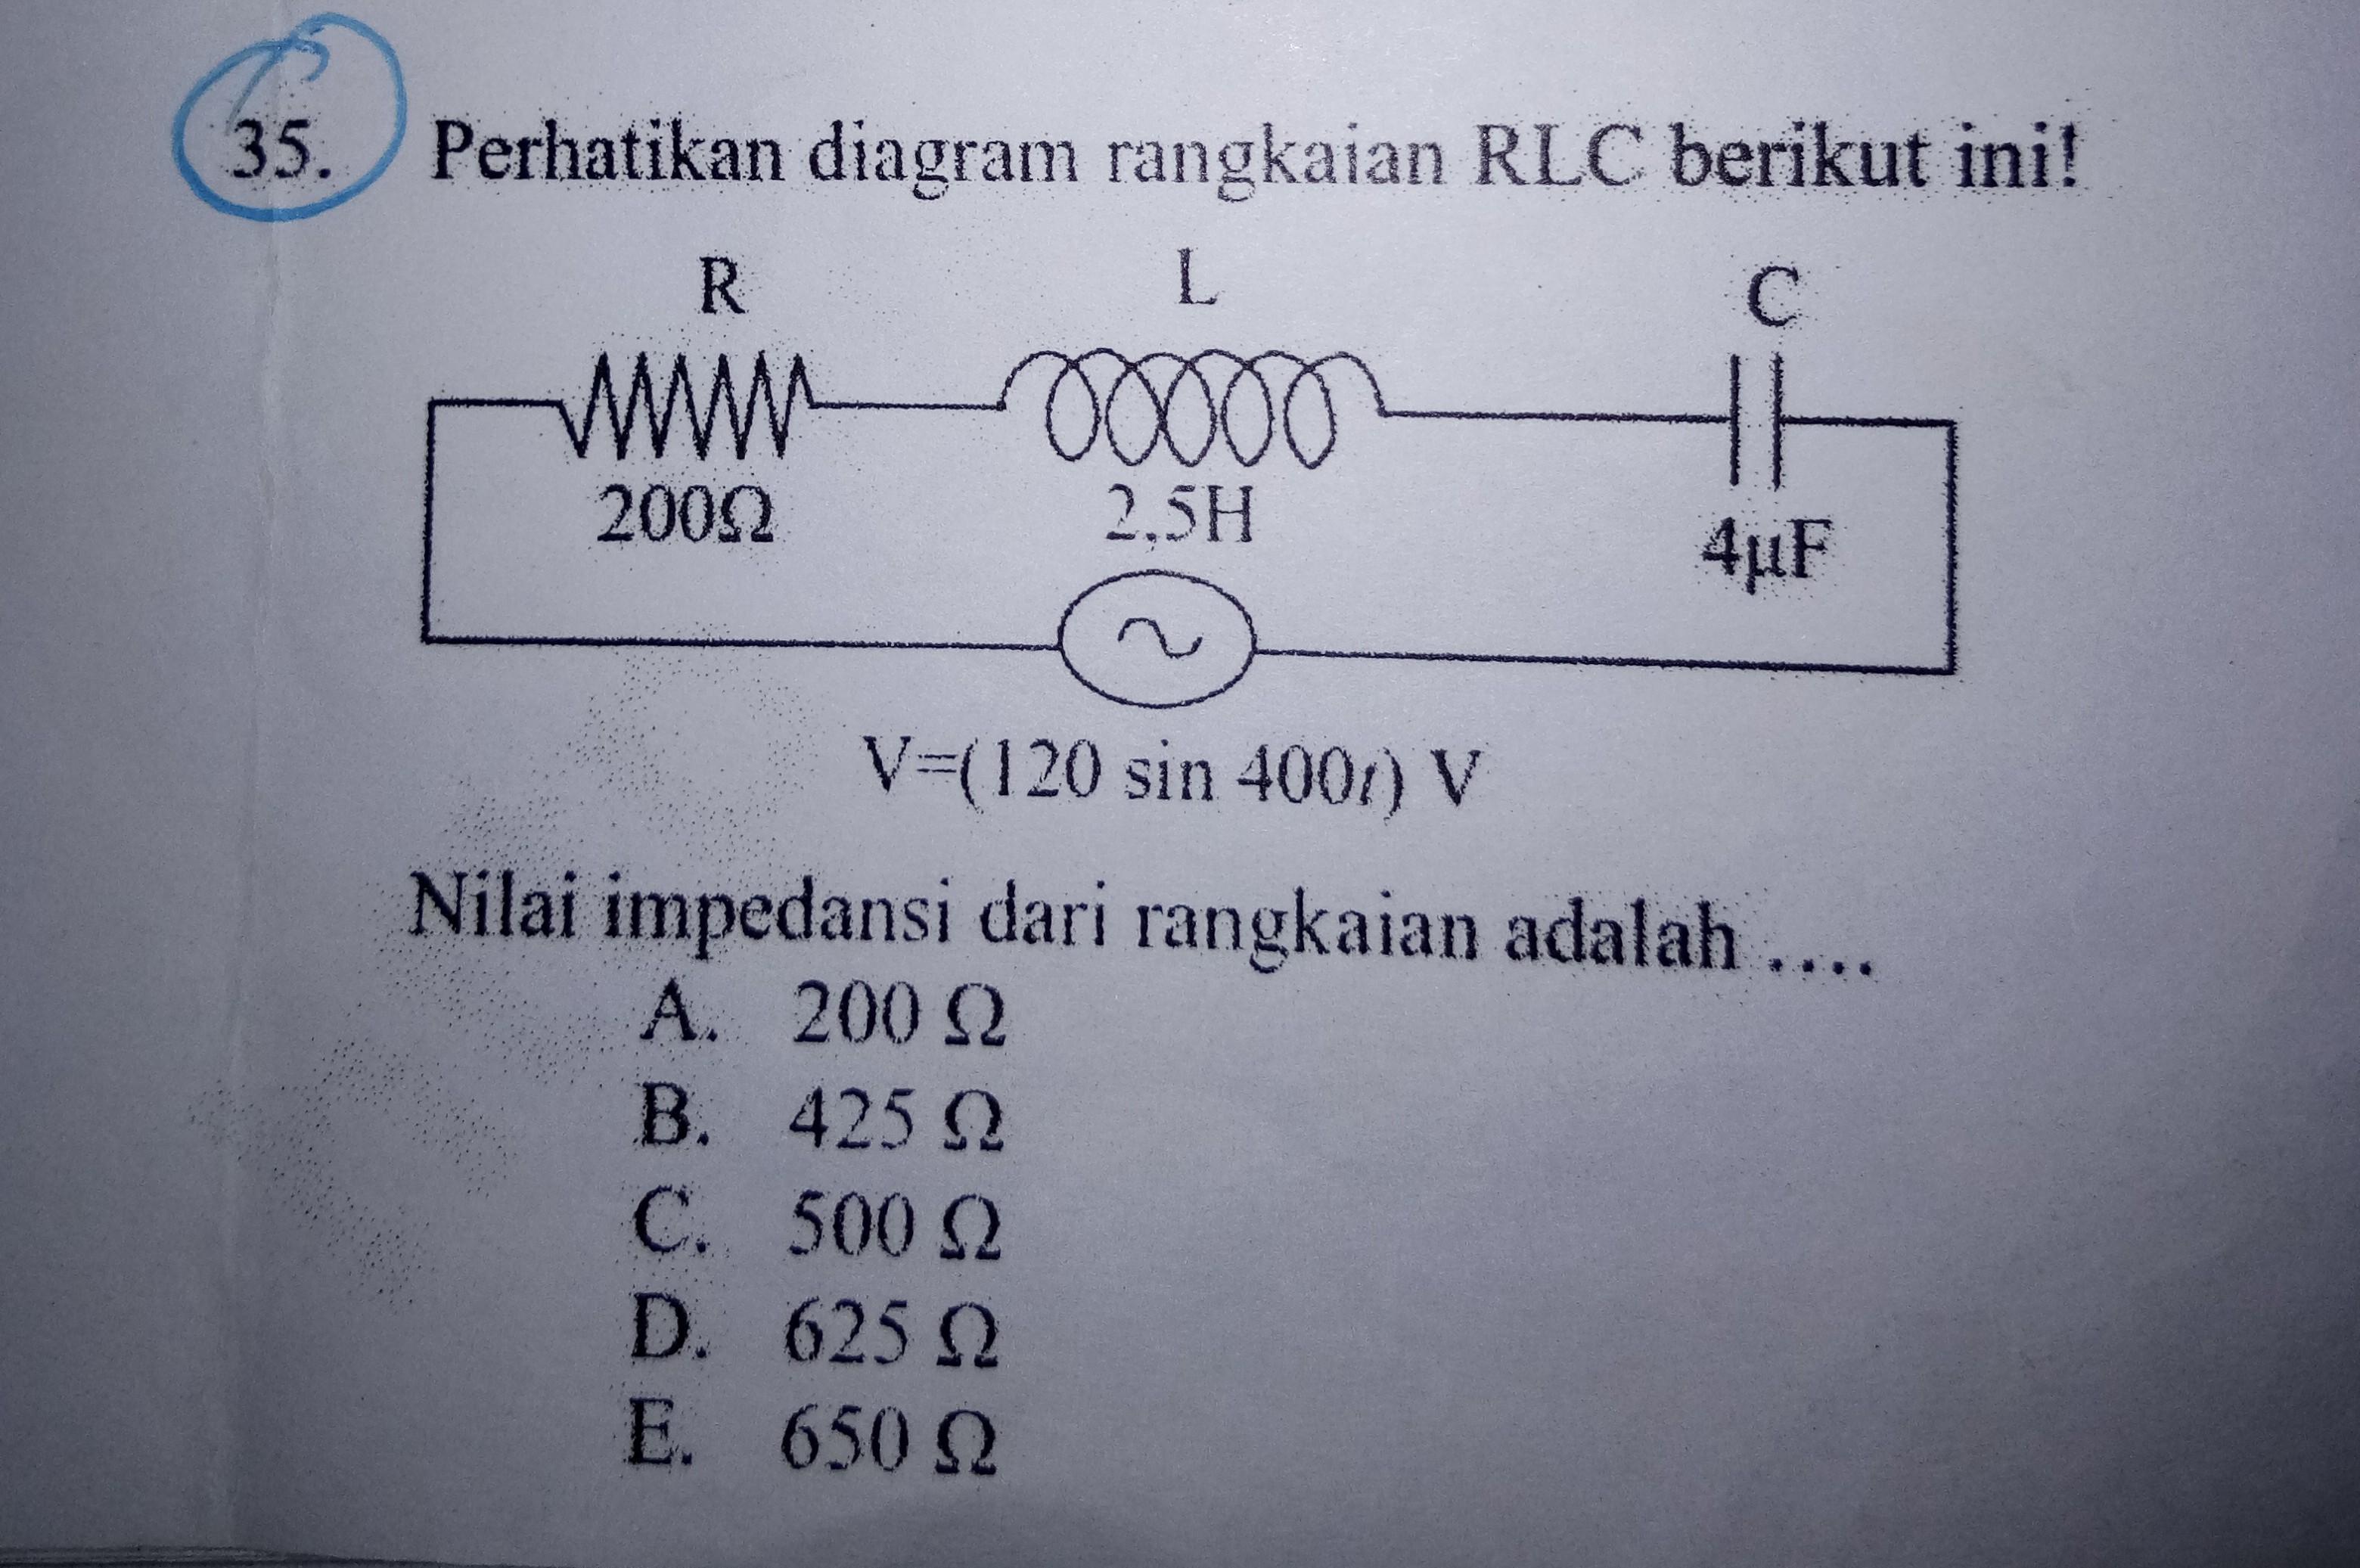 Perhatikan Diagram Rangkaian Rlc Berikut Ini Nilai Impedansi